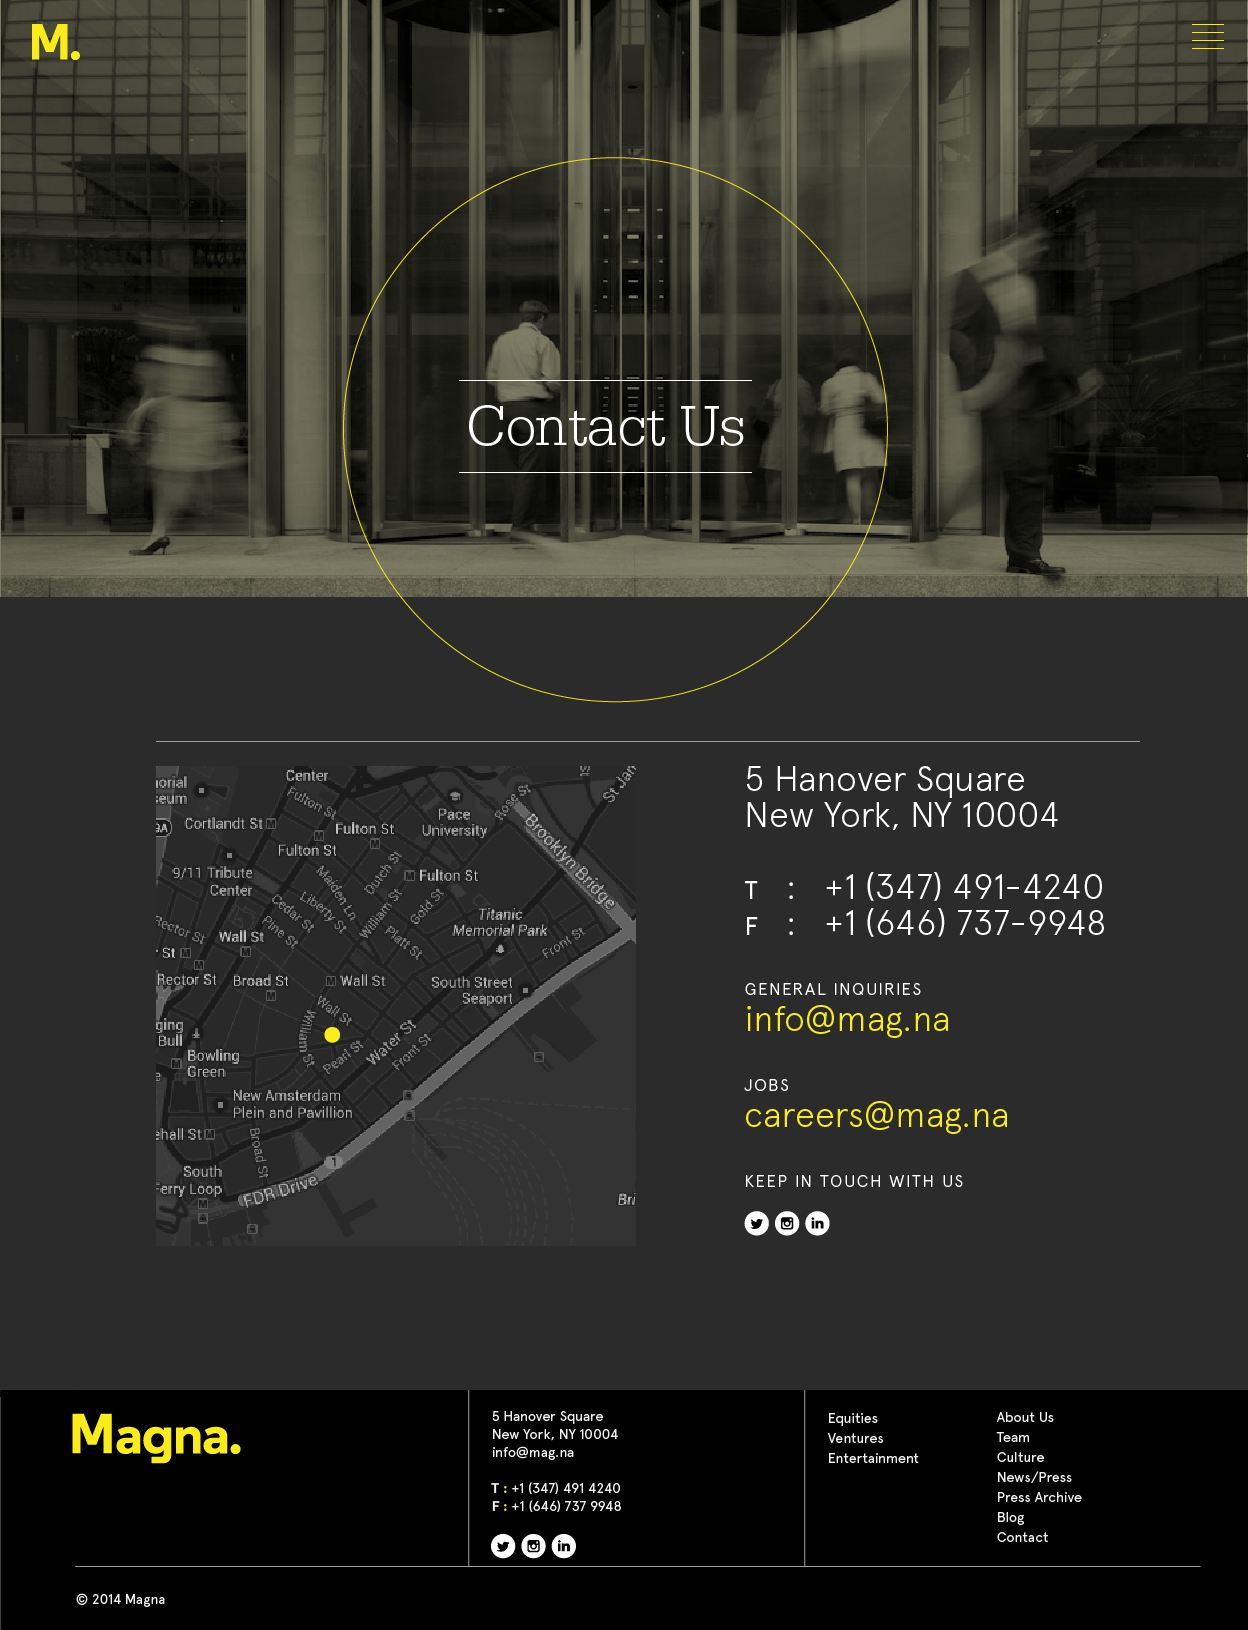 Magna_Web_r3_mobile_091914-06.png